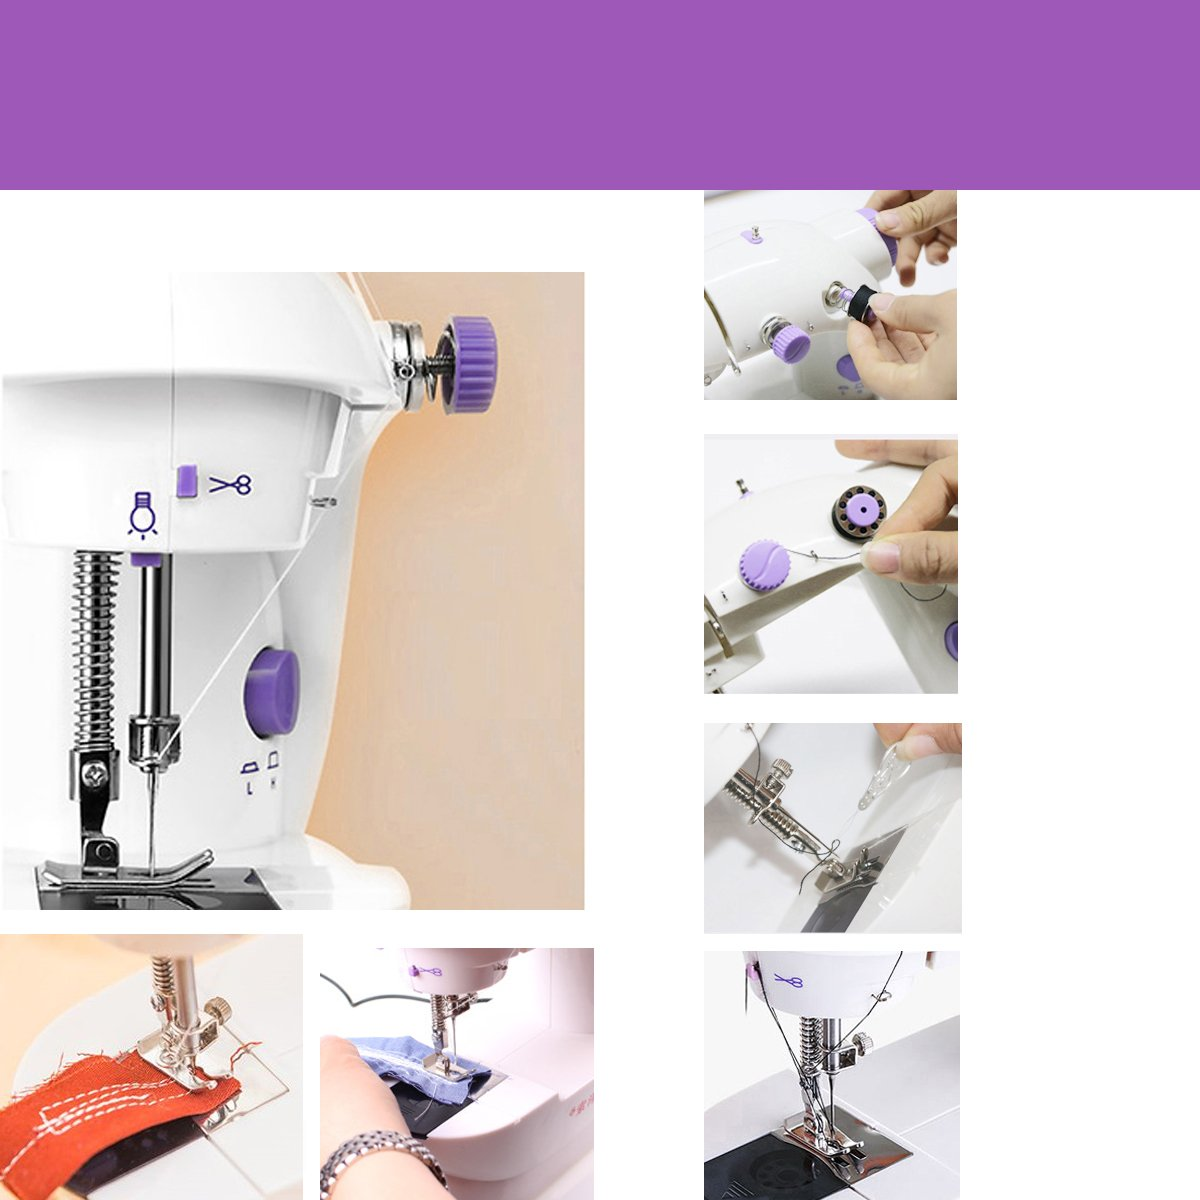 Nähmaschine Mini tragbare nähmaschine elektrische Haushalt ...